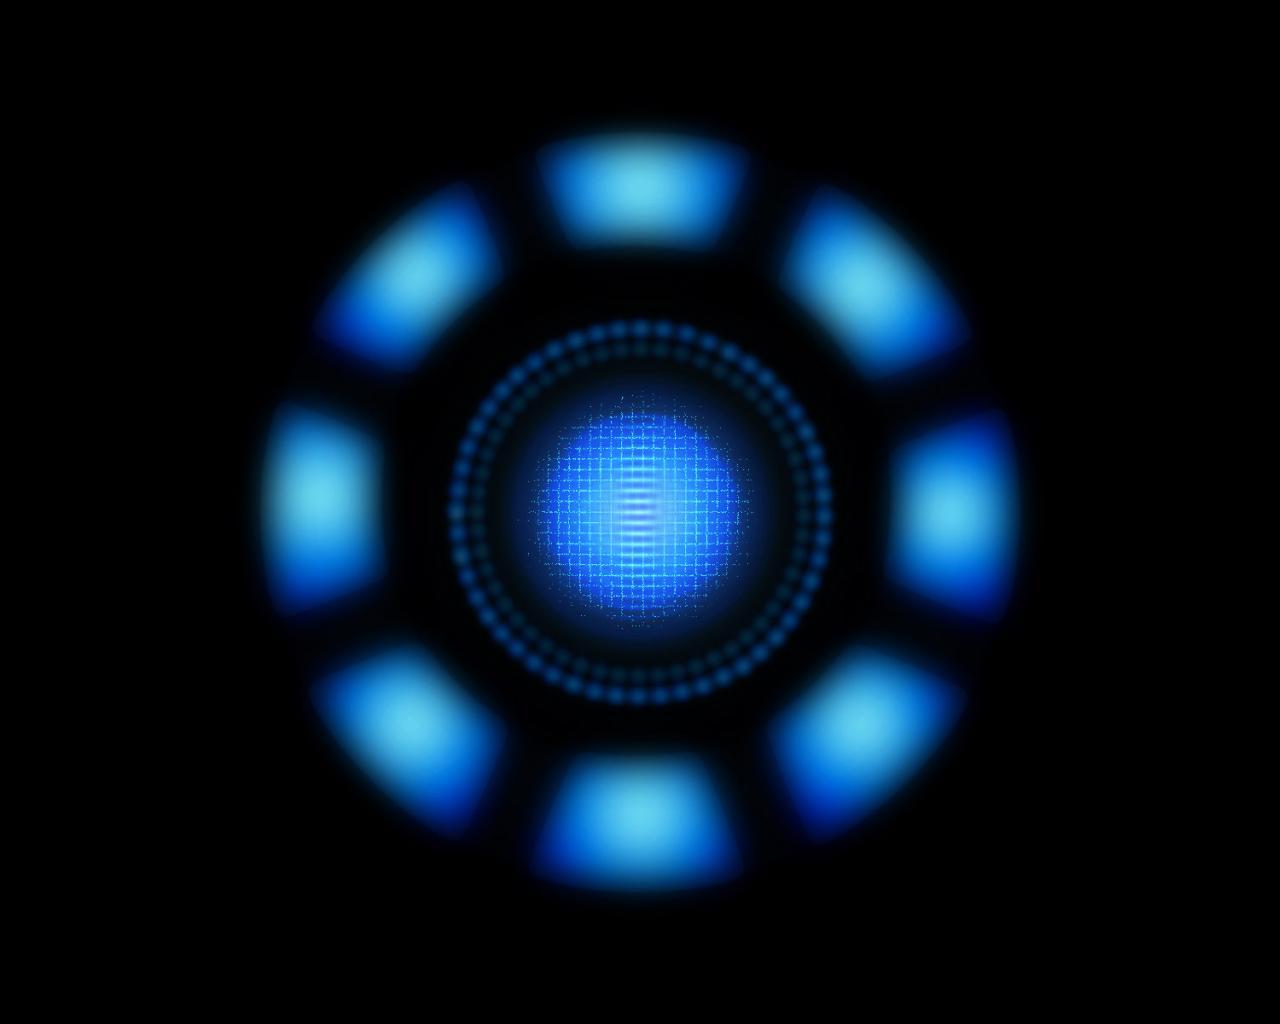 minimalistic iron man arc reactor Normal 43 640x480 800x600 1280x1024